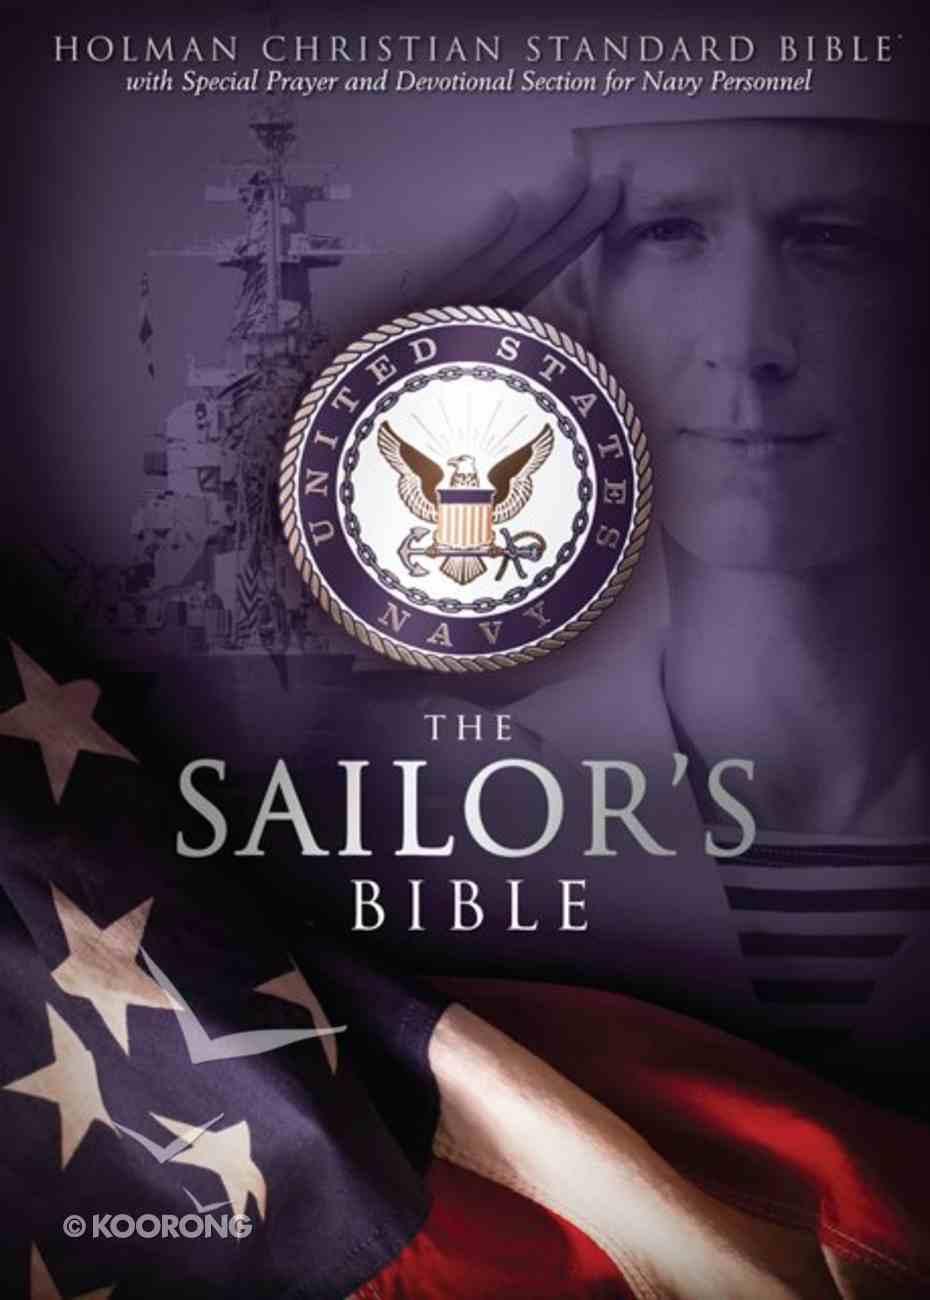 HCSB Sailor's Bible, Black Imitation Leather